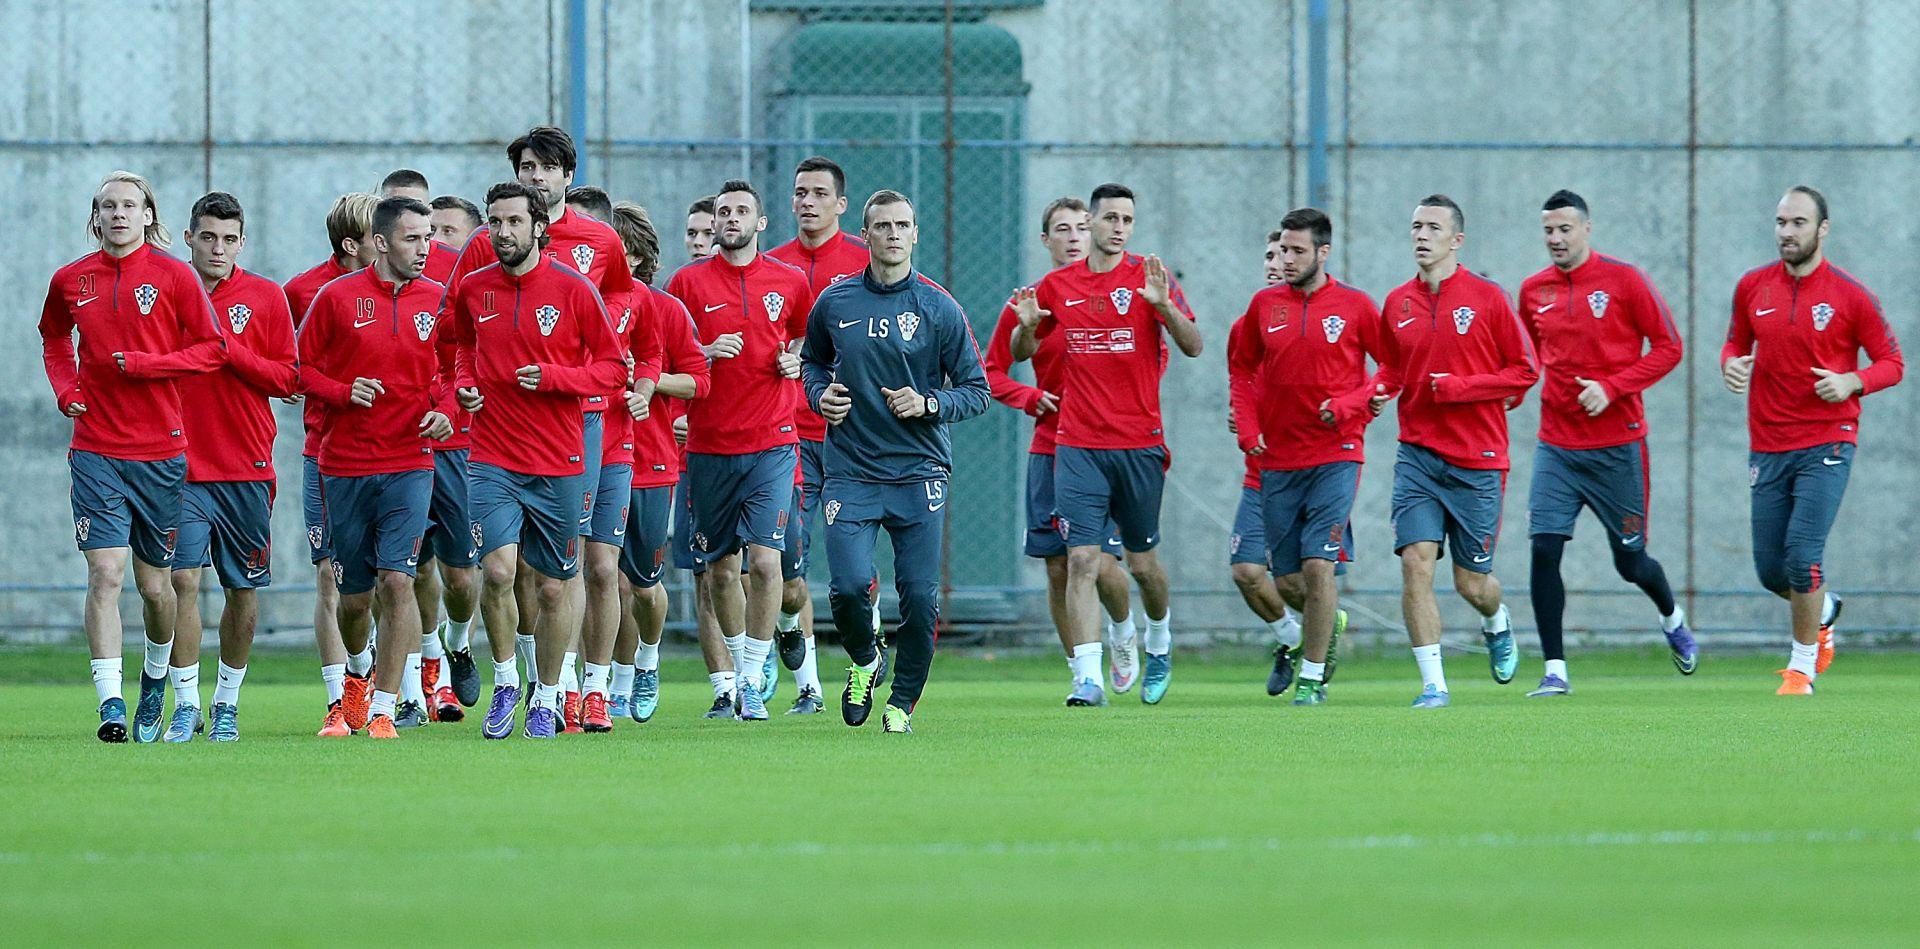 DEVETI SUSRET Hrvatska igra prijateljsku utakmicu protiv Izraela 23. ožujka